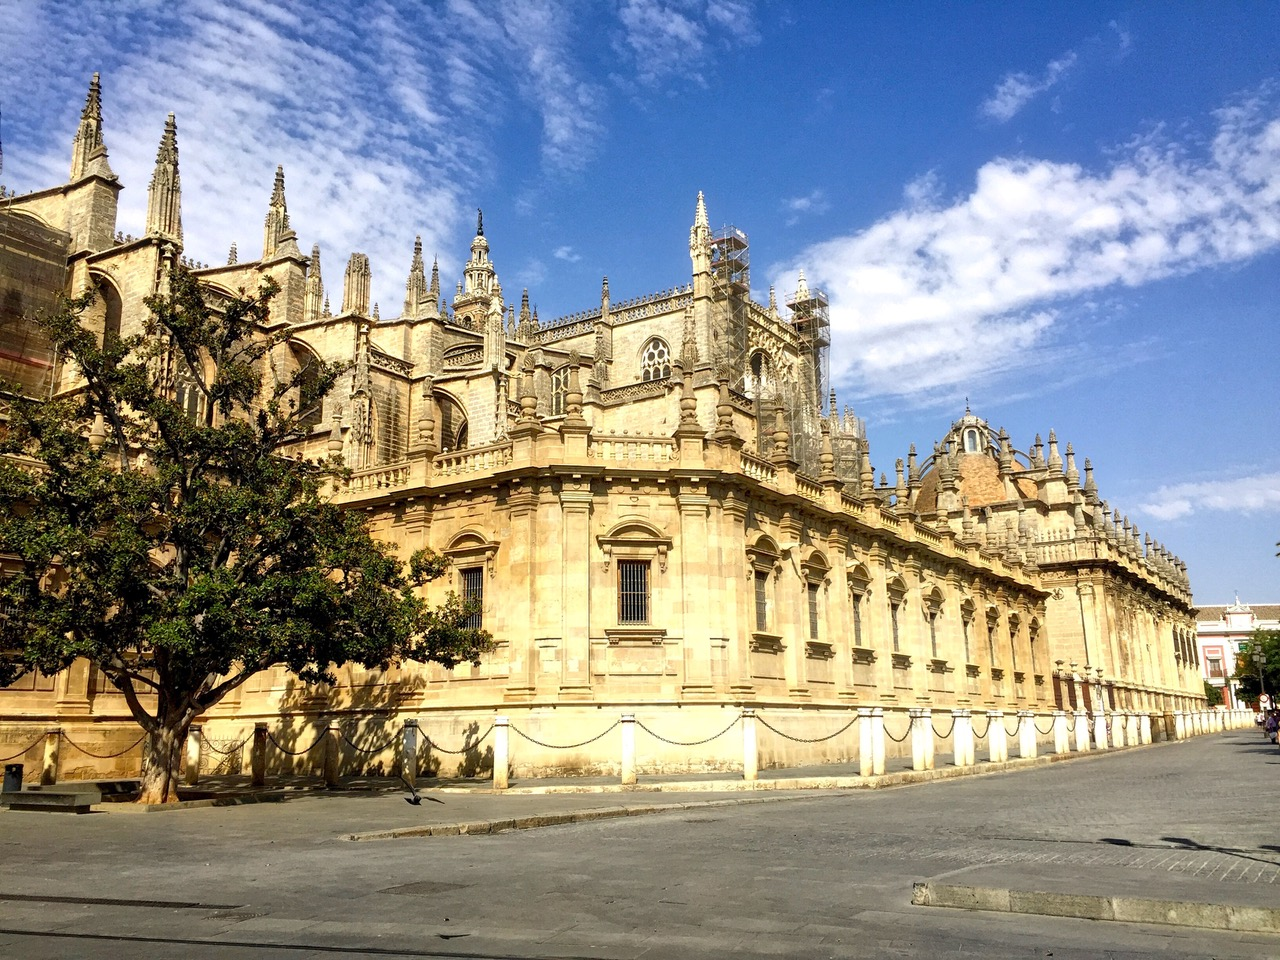 Catedral de Sevilla in Sevilla, Spain